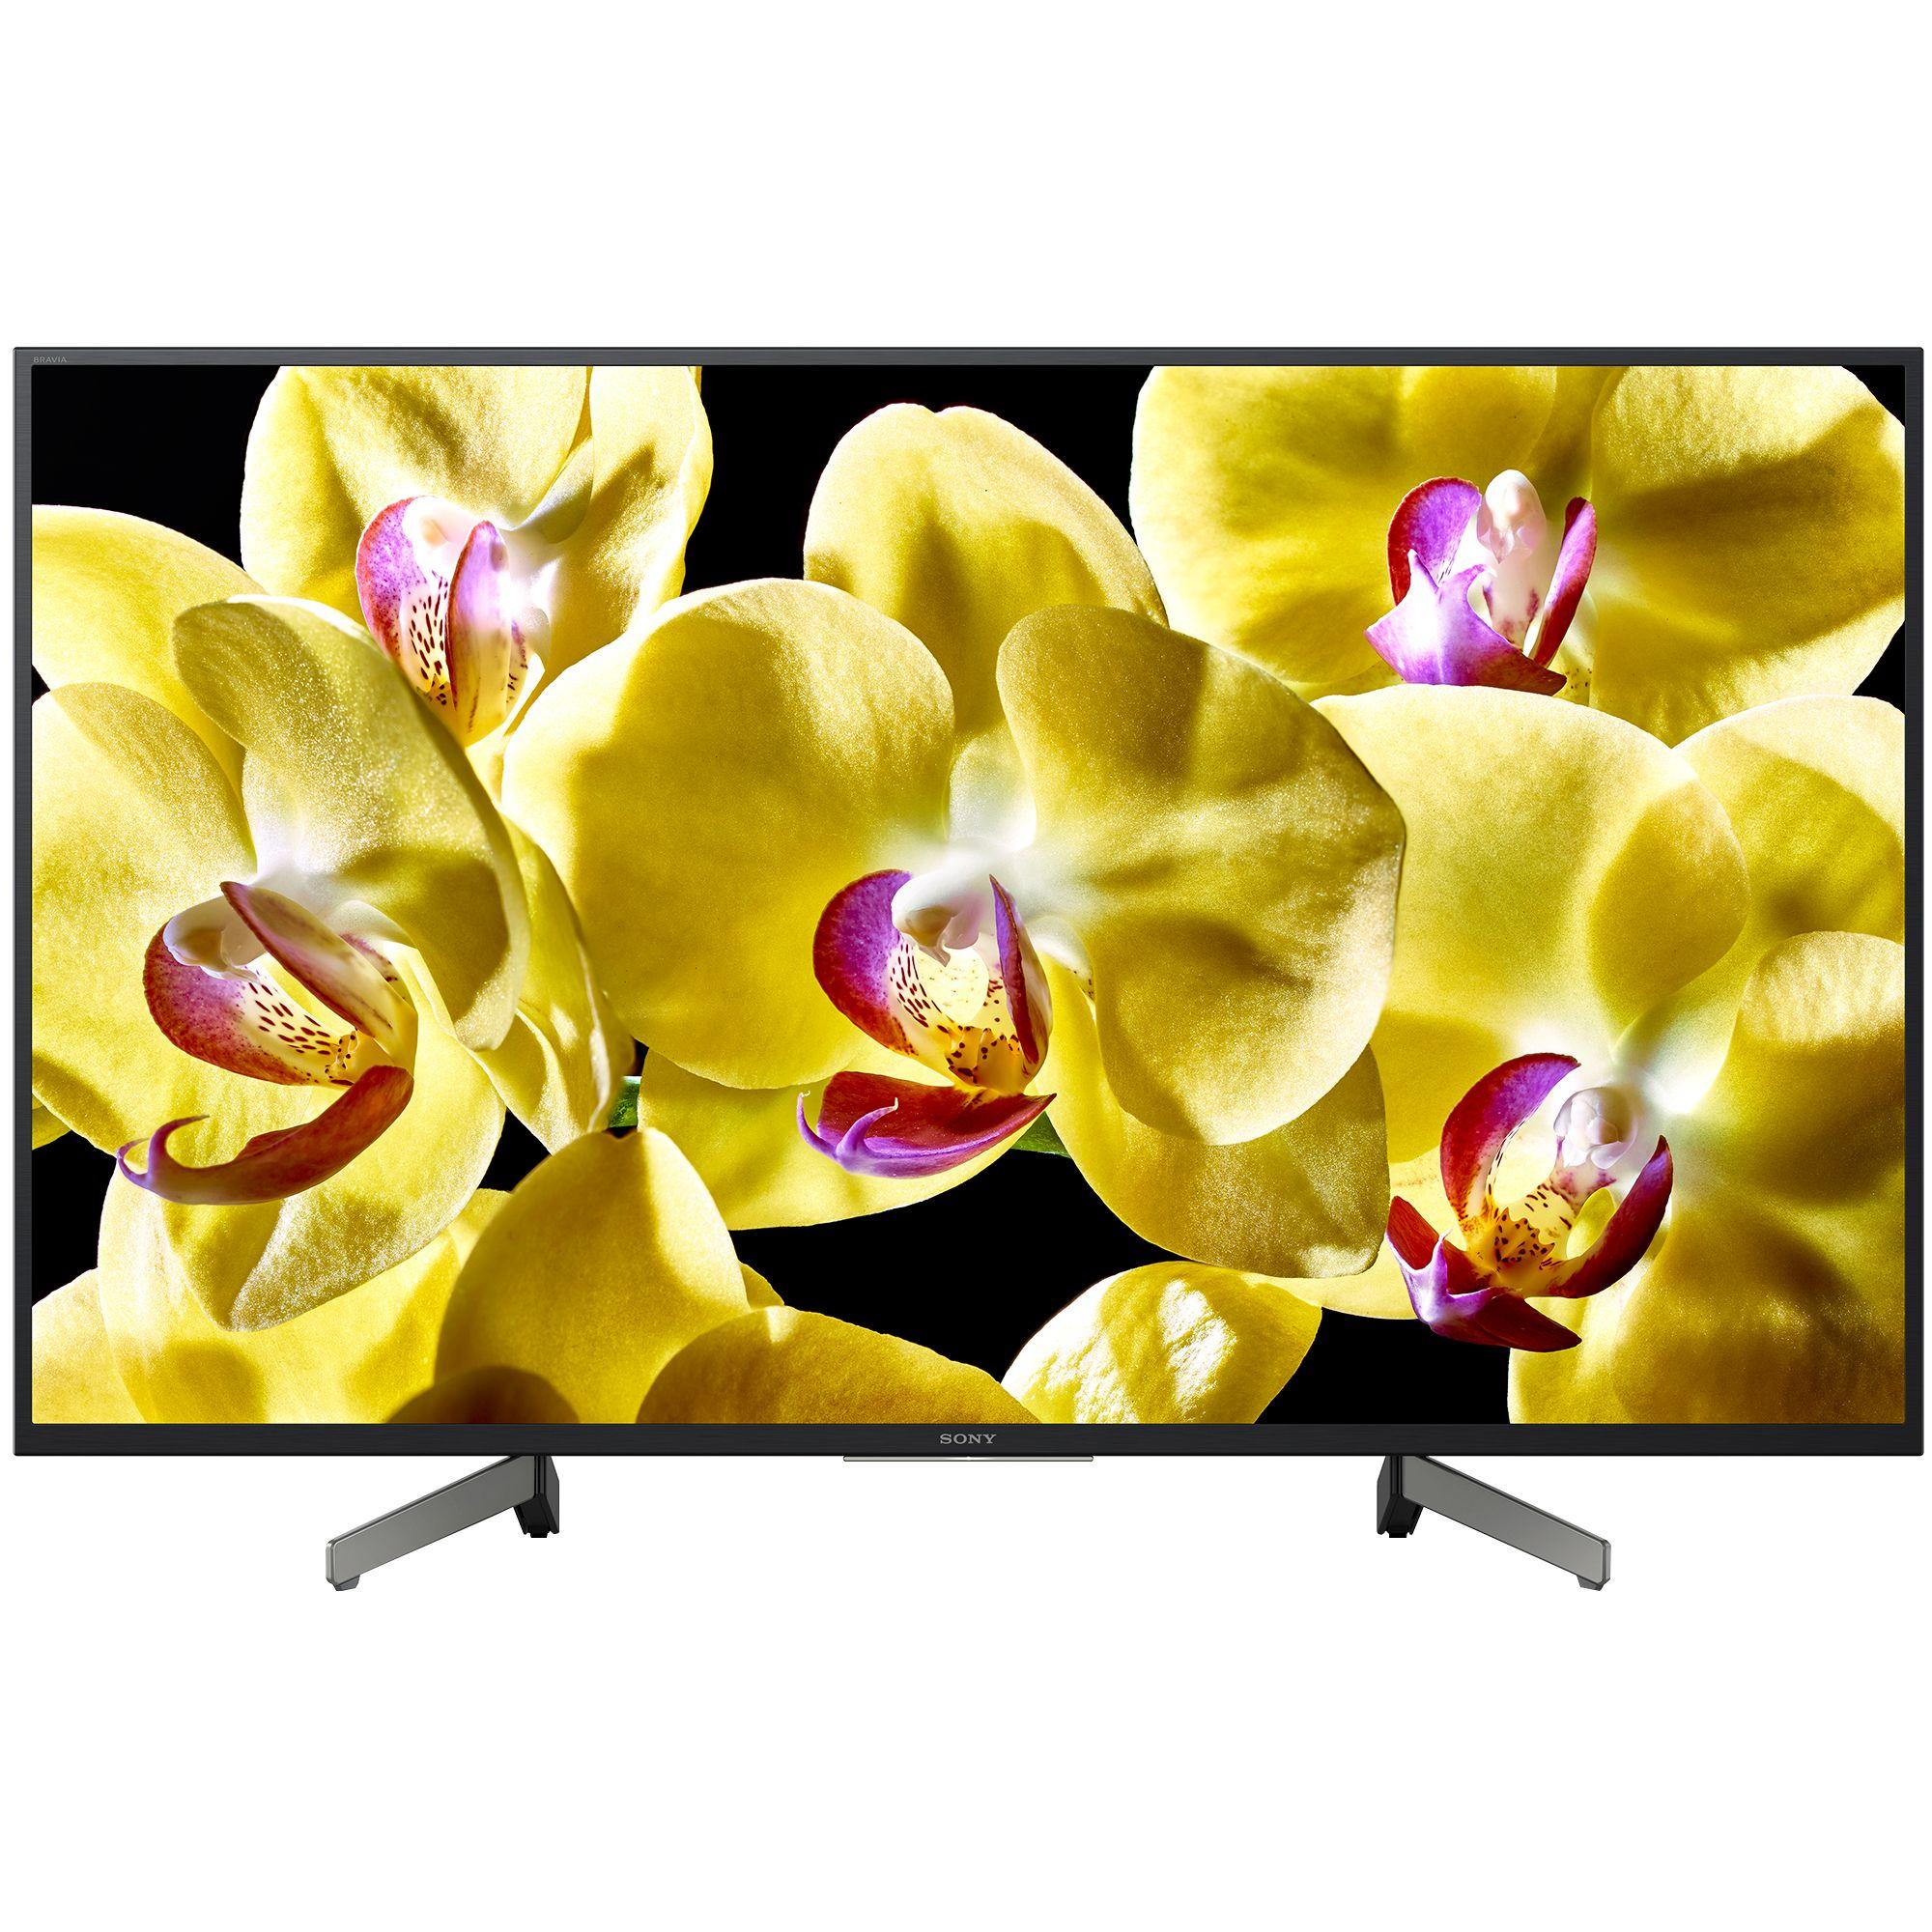 Fotografie Televizor Smart Android LED Sony BRAVIA, 123.2 cm, 49XG8096, 4K Ultra HD